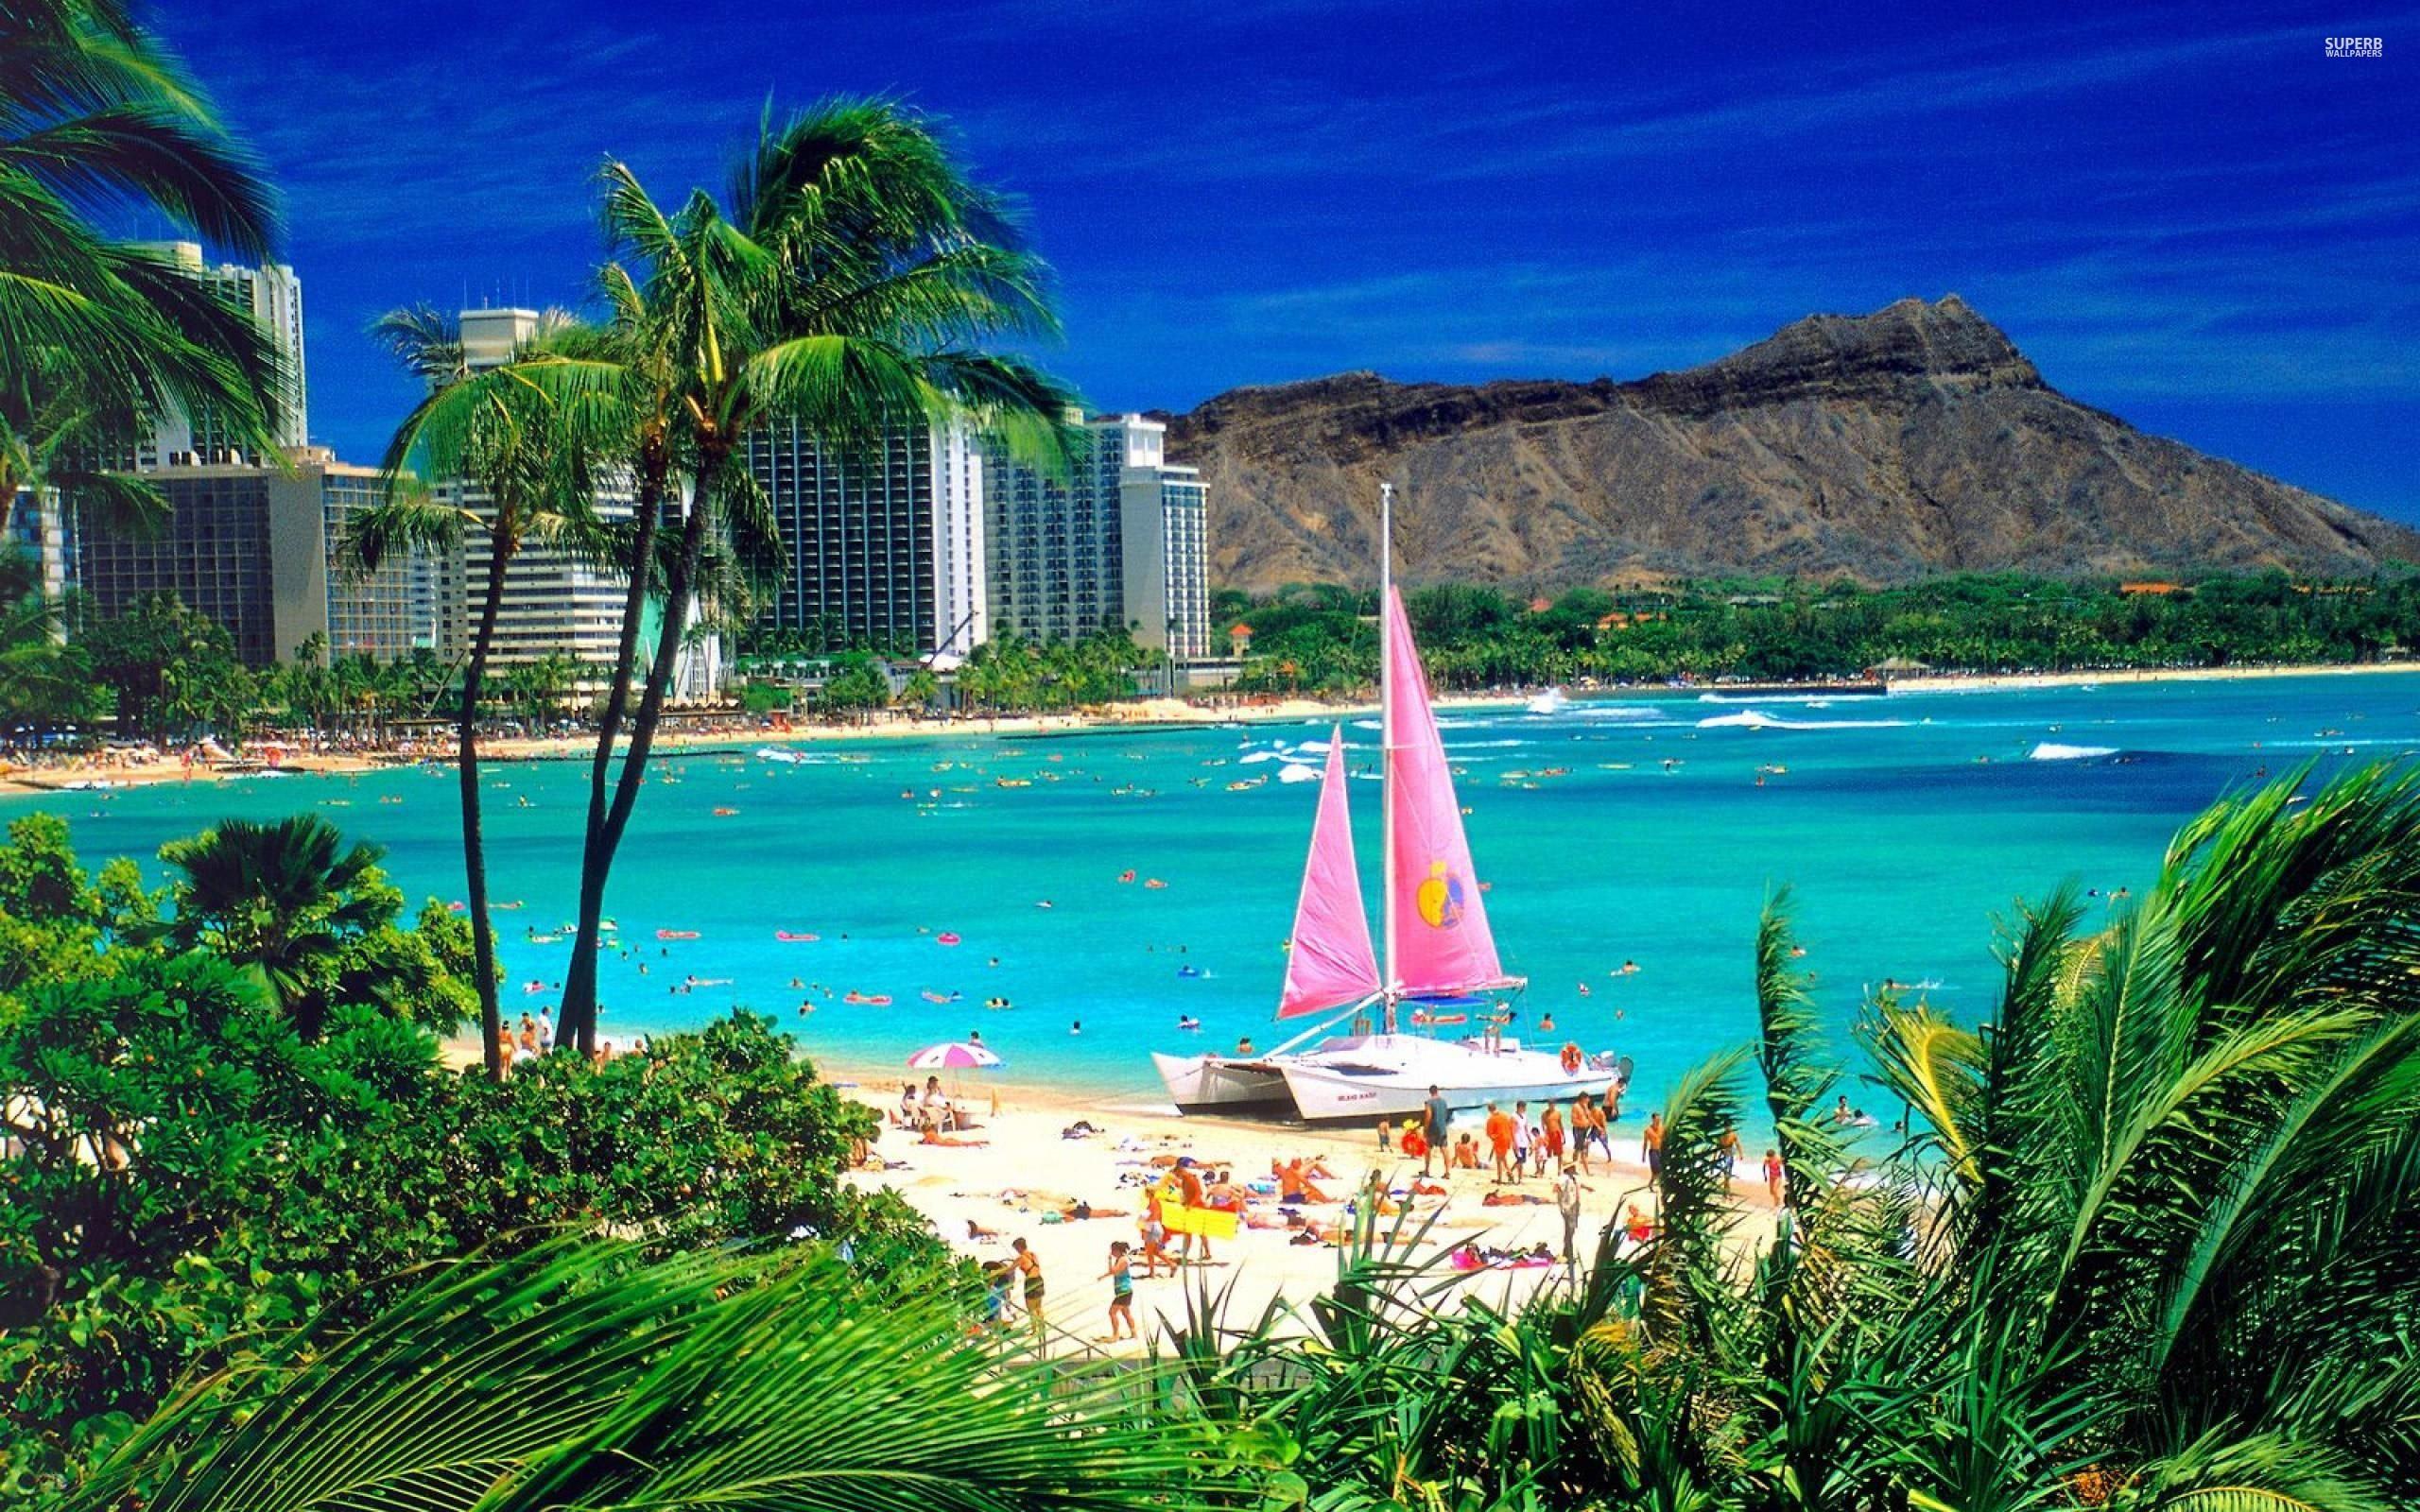 Hawaii Wallpaper 66 Images